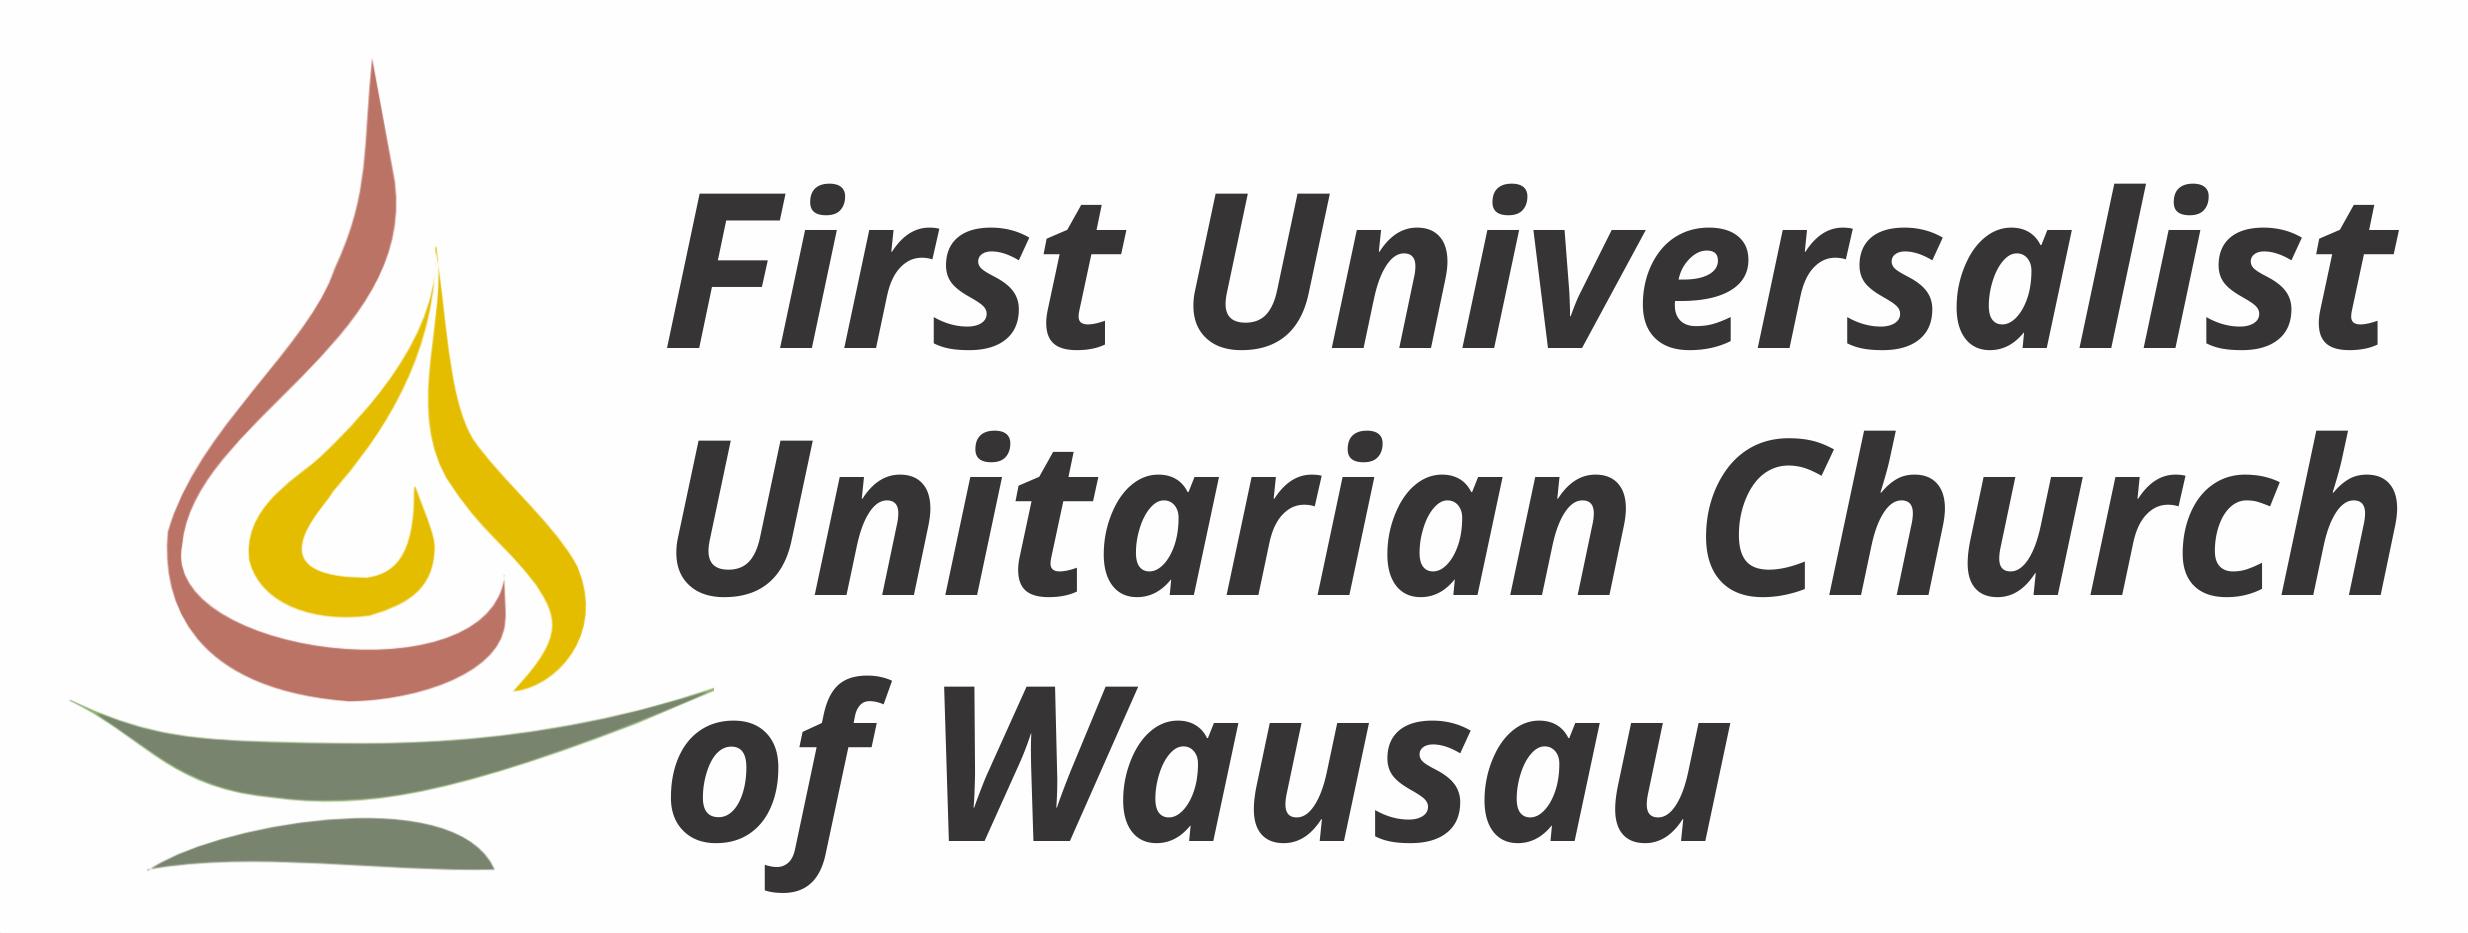 UU Wausau